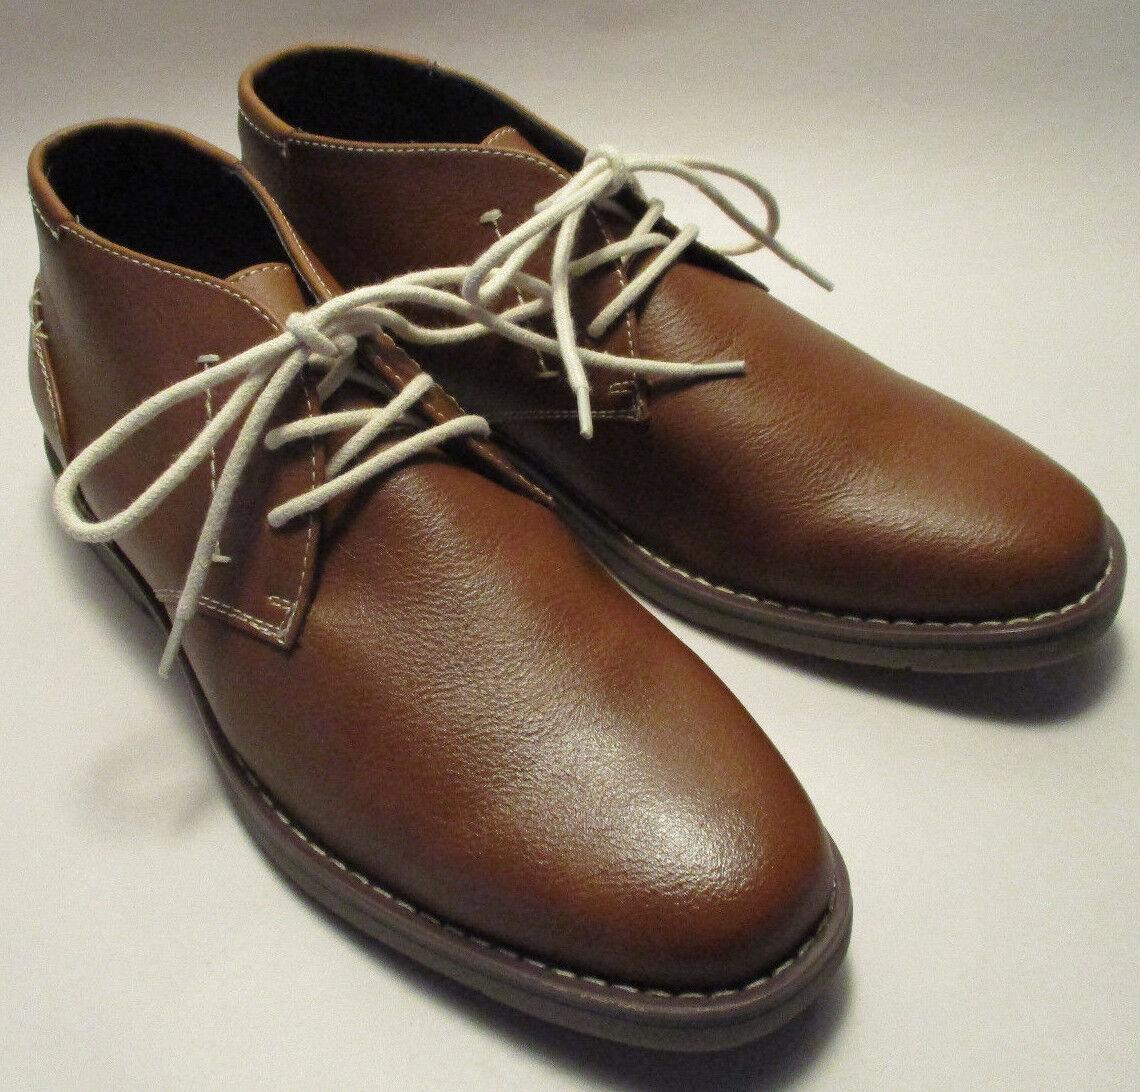 New in Box Arizona Ssilver Chukka Mens 8M Tan Lace Up Padded shoes